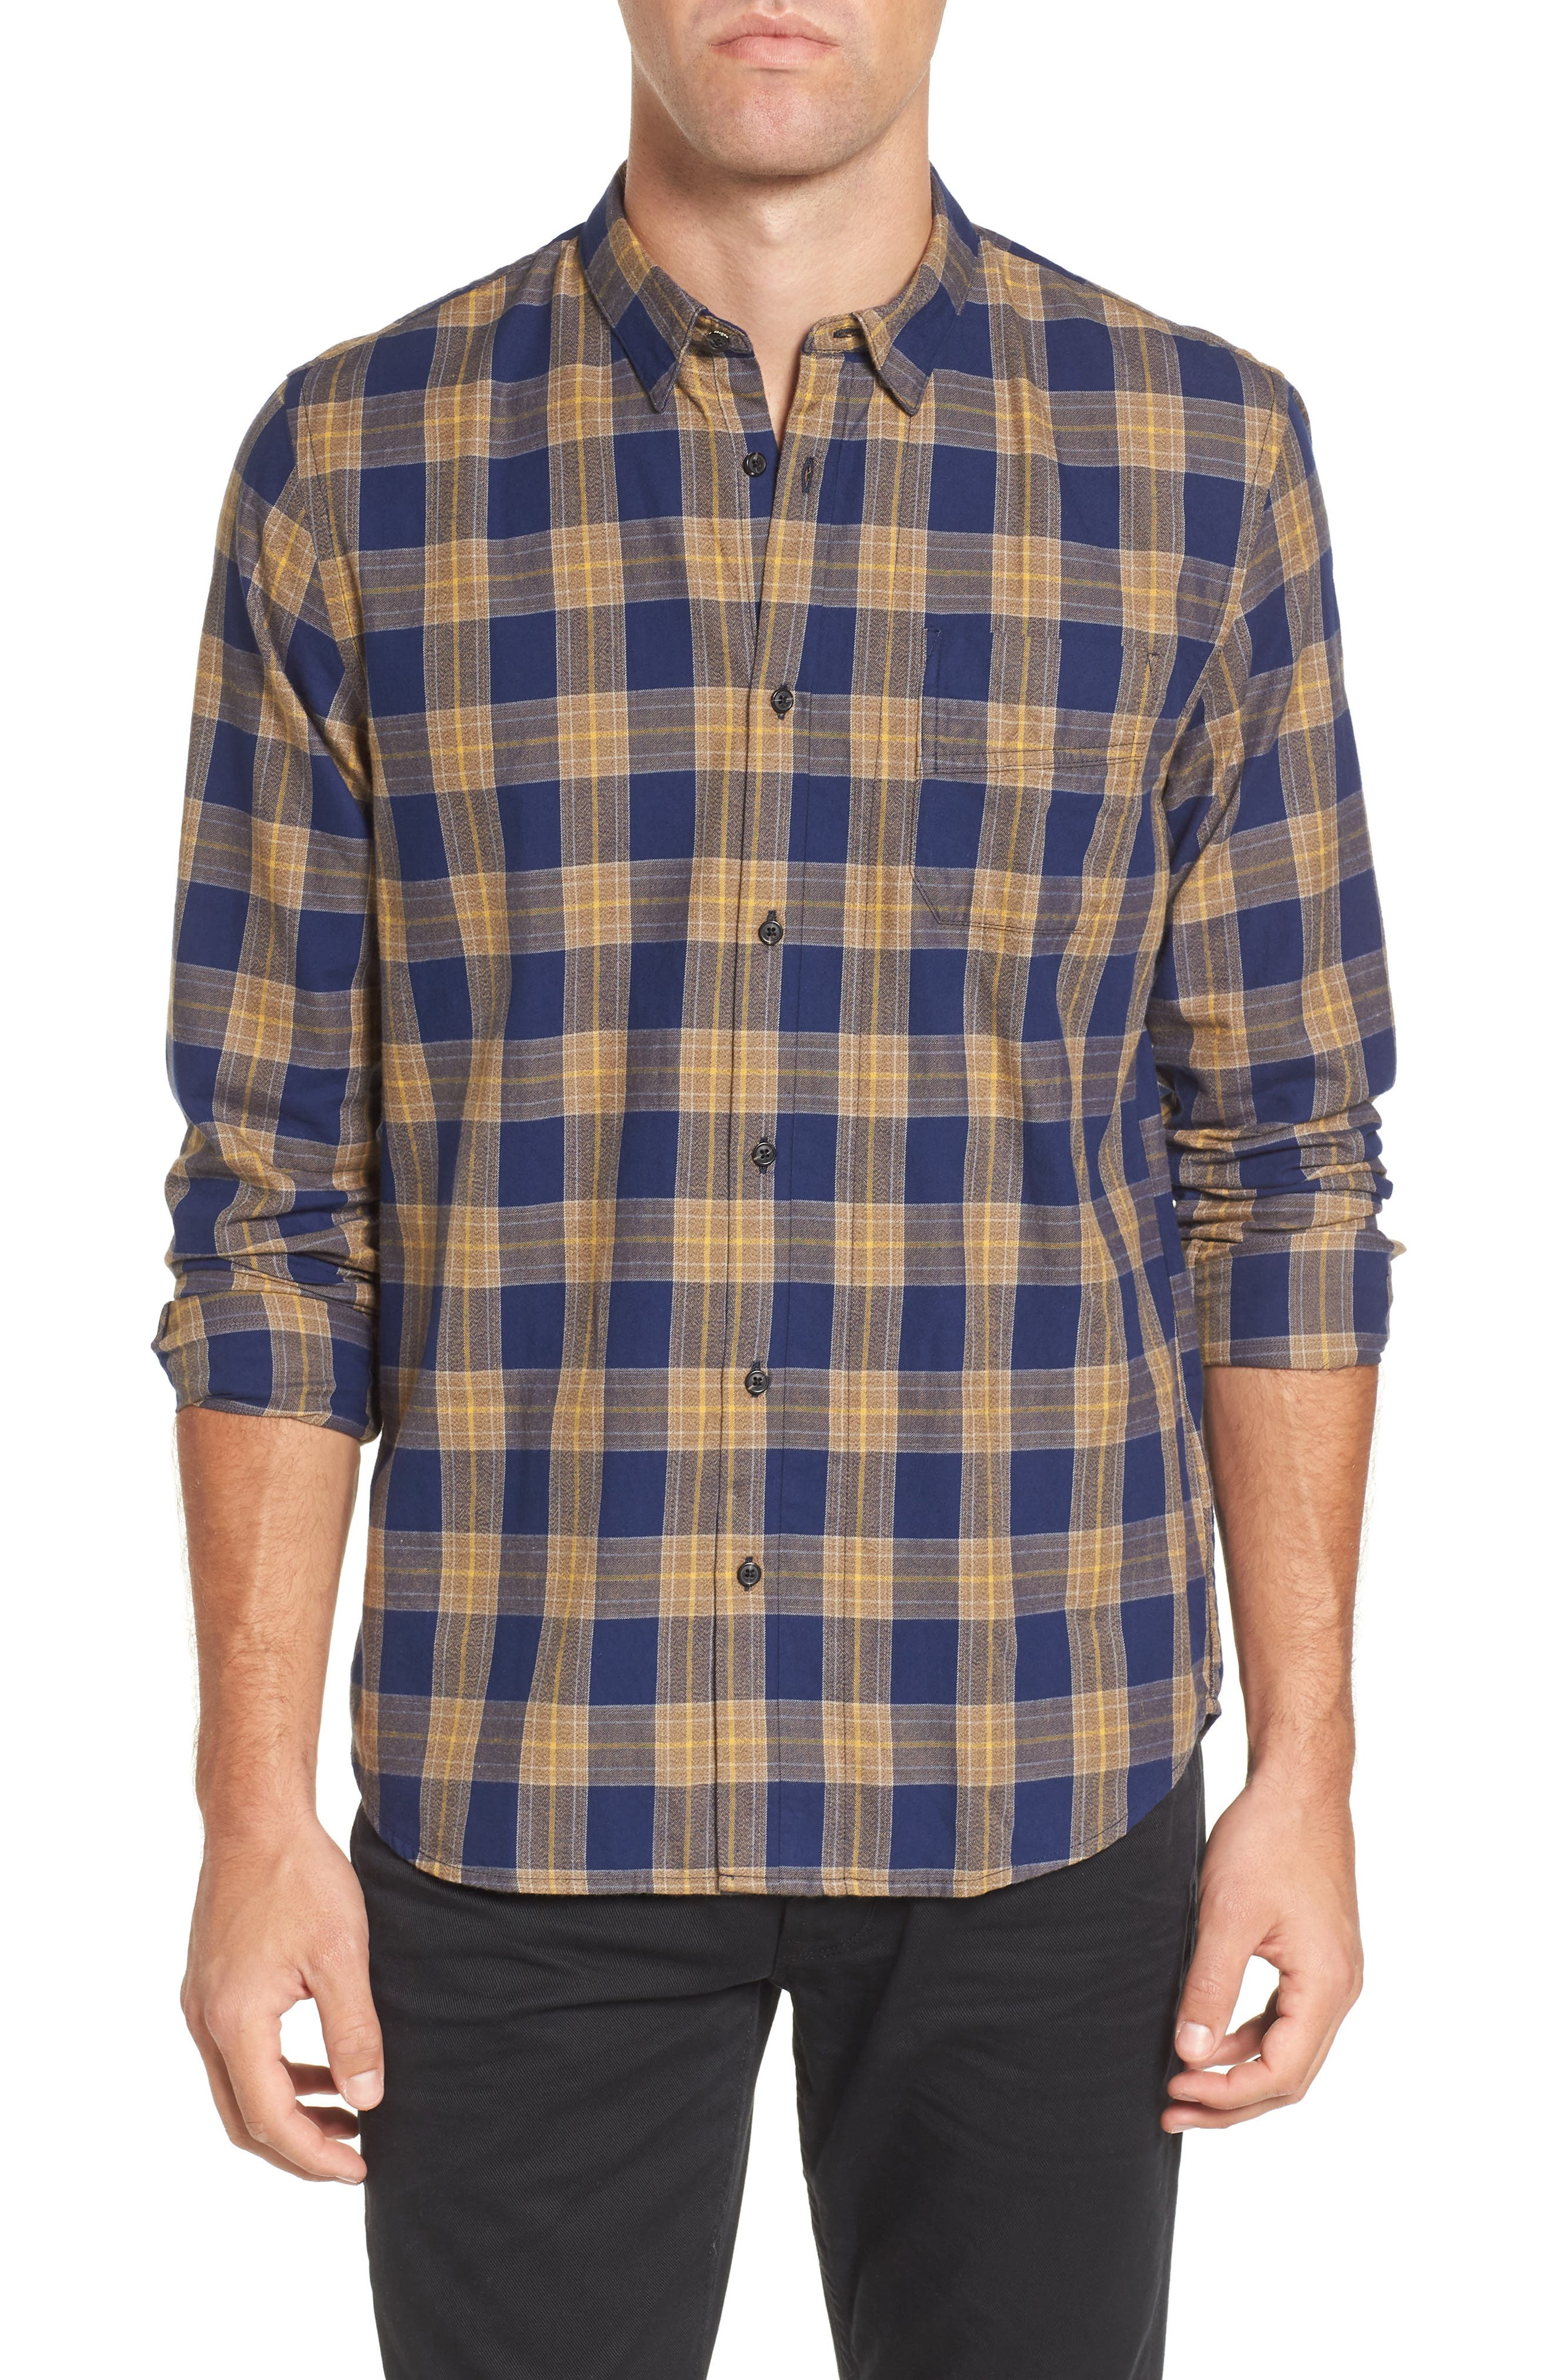 Scotch & Sode Brushed Cotton Shirt,                             Main thumbnail 1, color,                             Blue